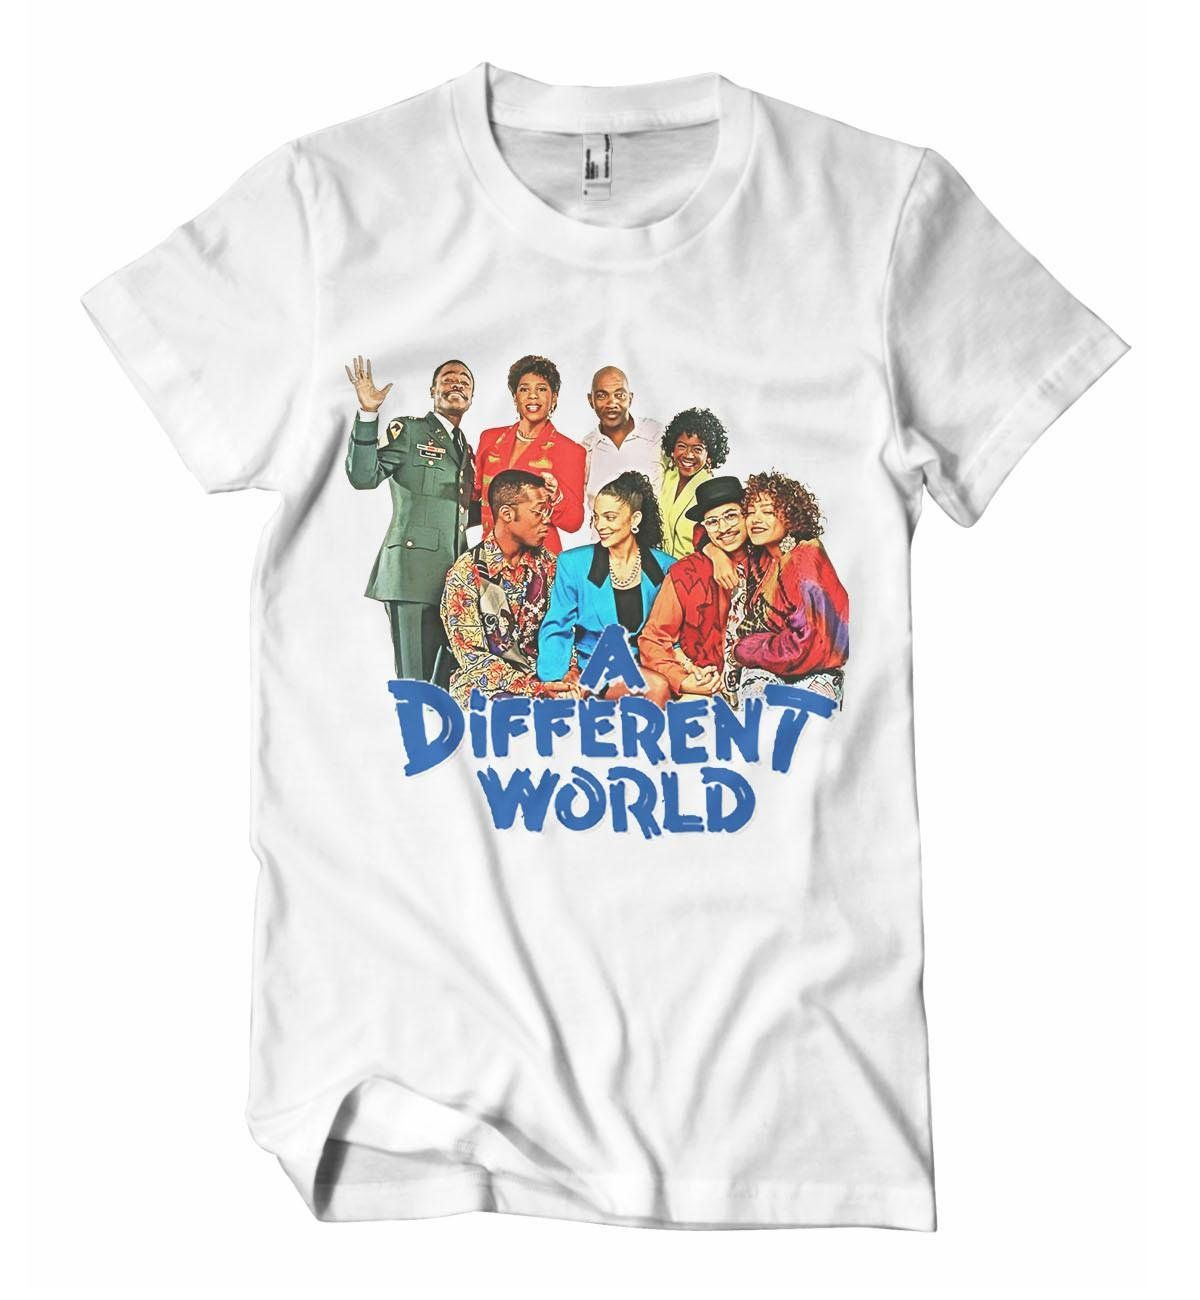 7056ba294 A Different World Cast T-Shirt - Izzy & Liv - crew neck | Shirts I ...